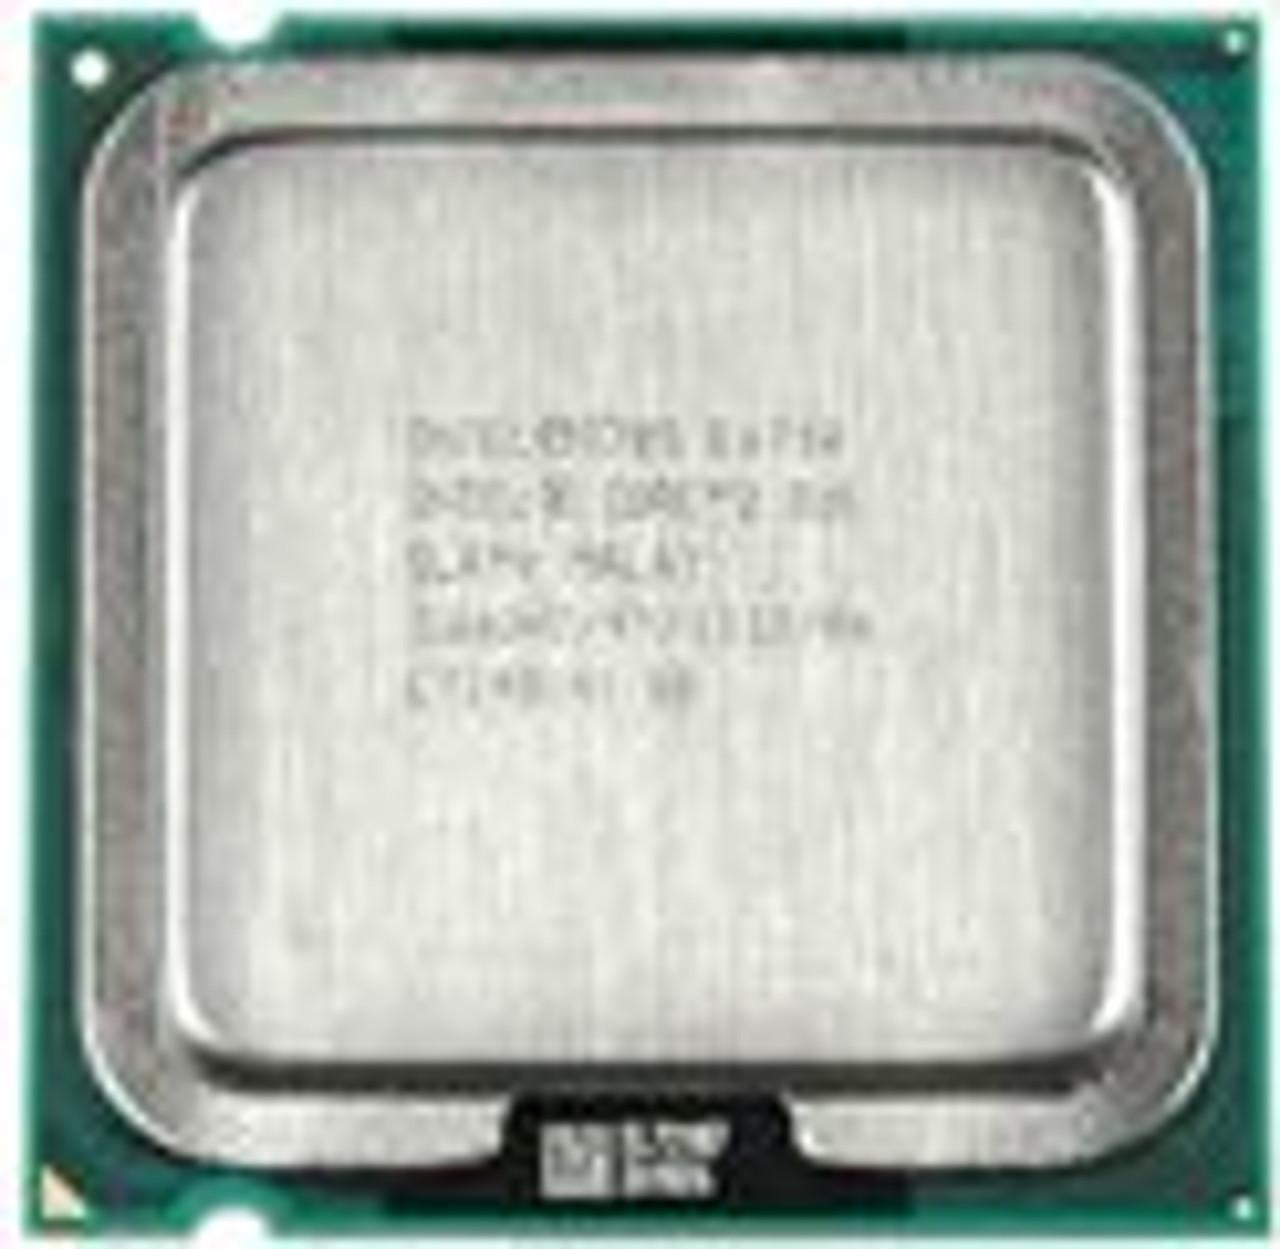 Intel HH80557PH0462M Core 2 Duo E6300 1.86GHz Socket T LGA775 Processor SL9SA